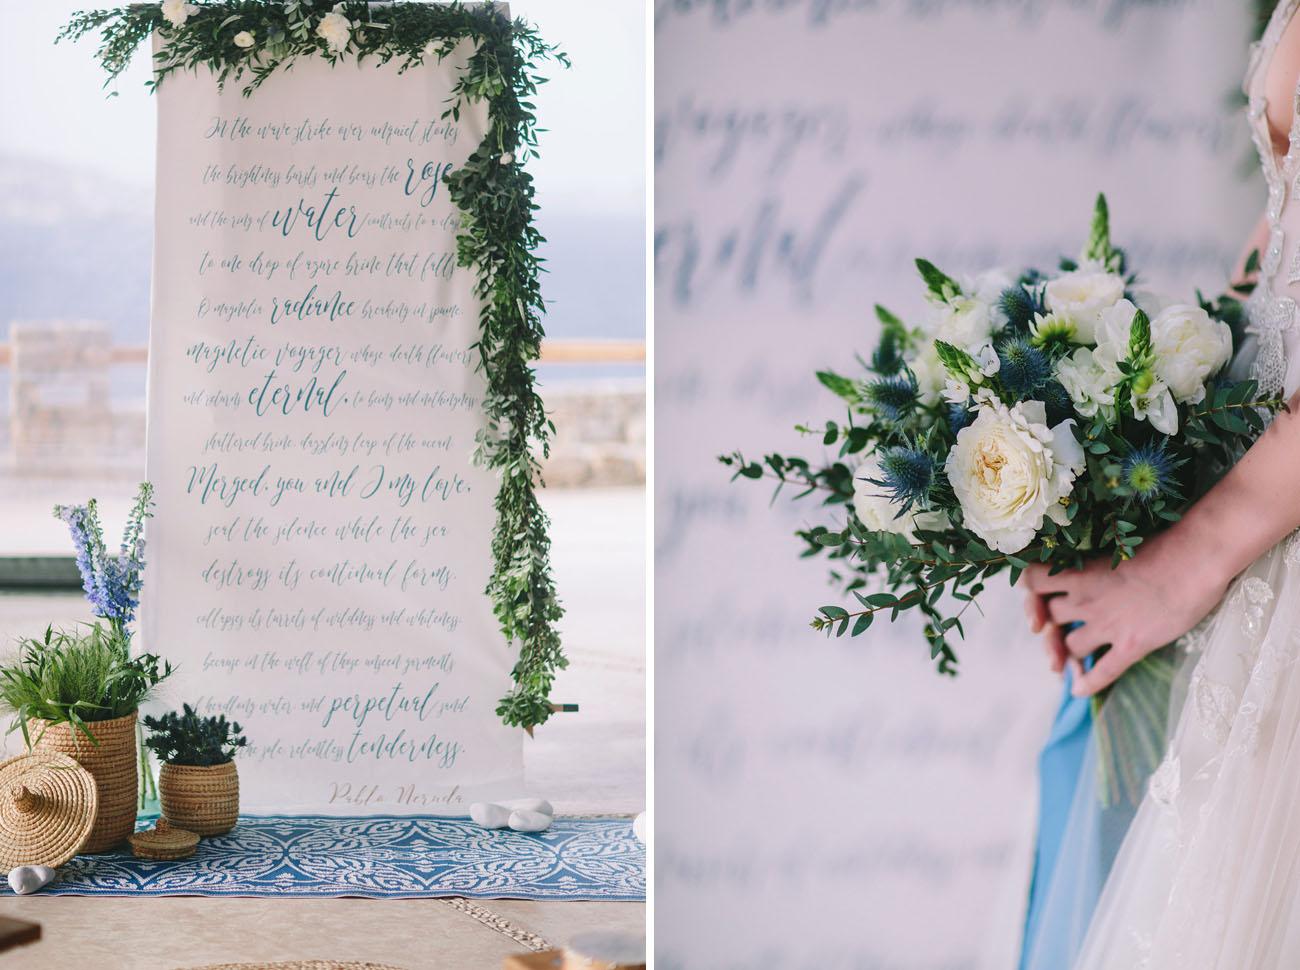 Indigo + Copper Wedding Inspiration in Mykonos, Greece - Green ...